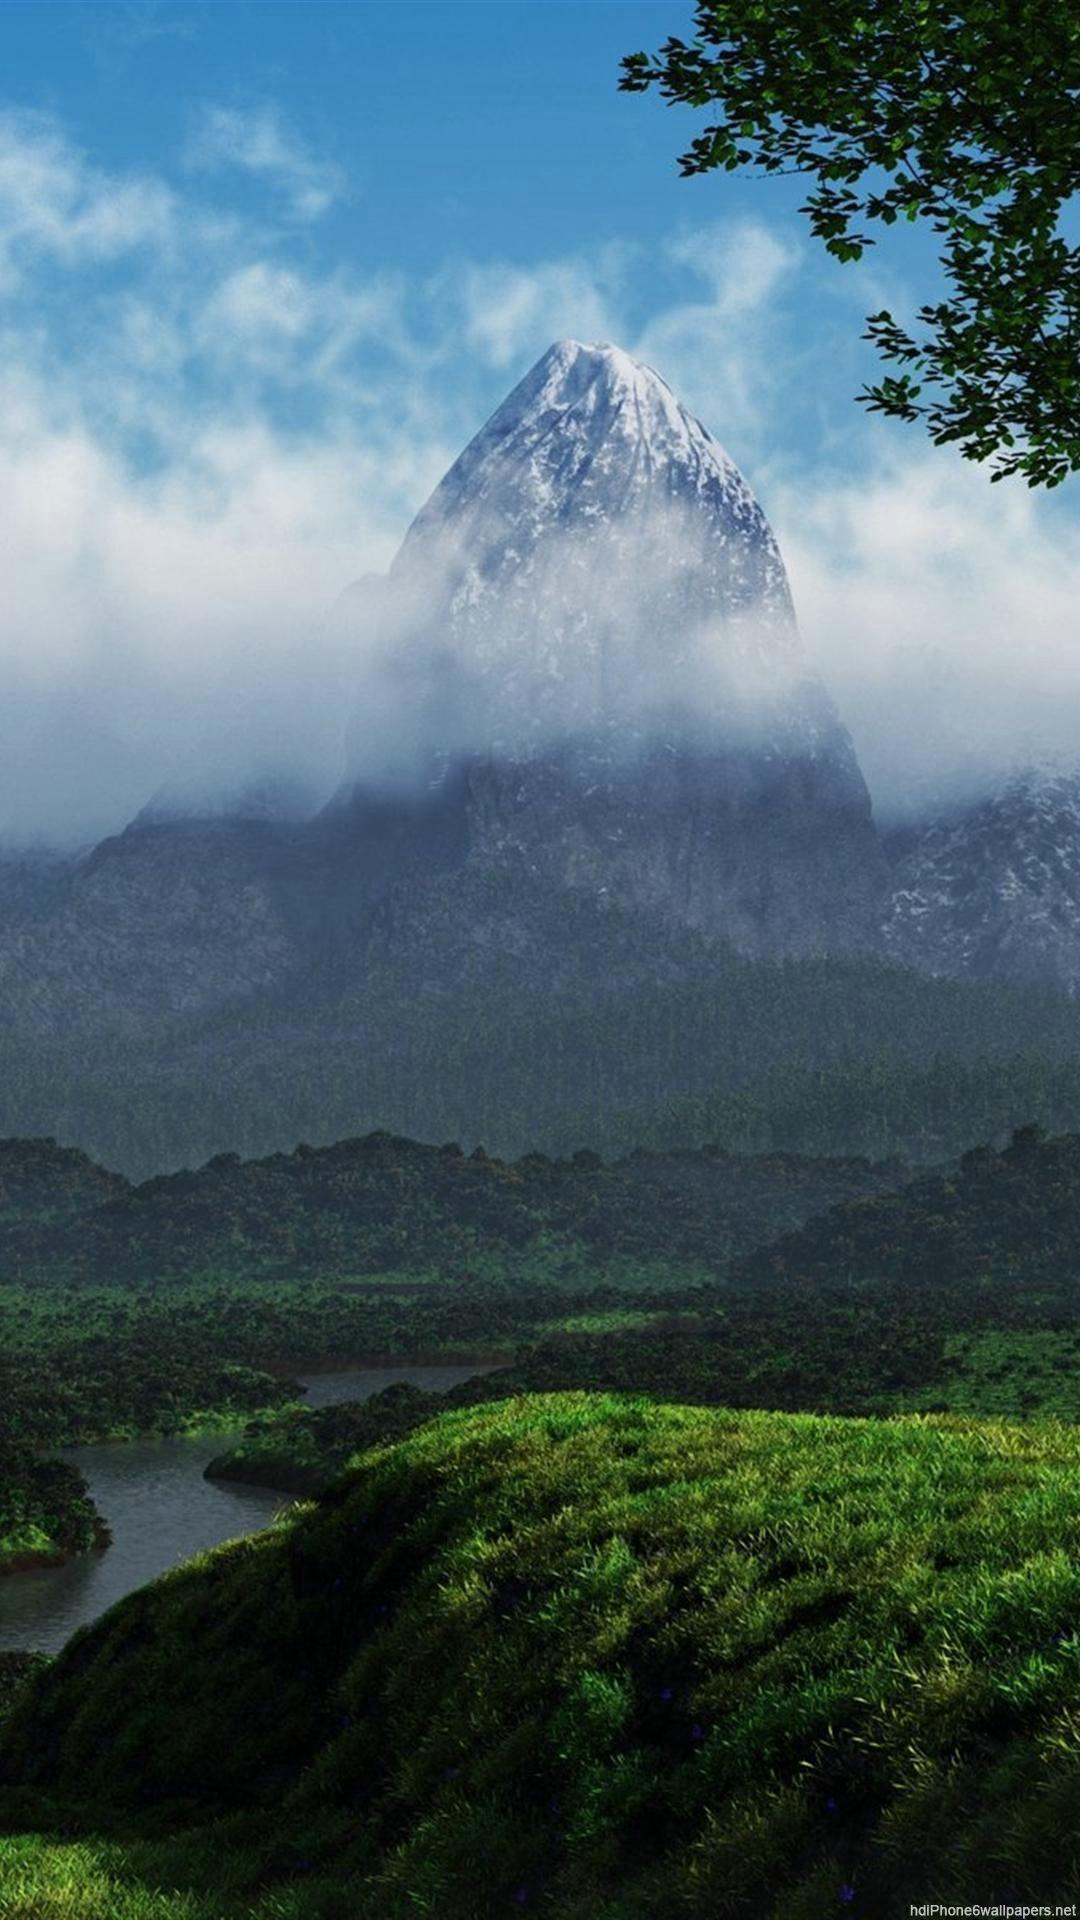 iphone 6 wallpaper retina mountain - photo #19